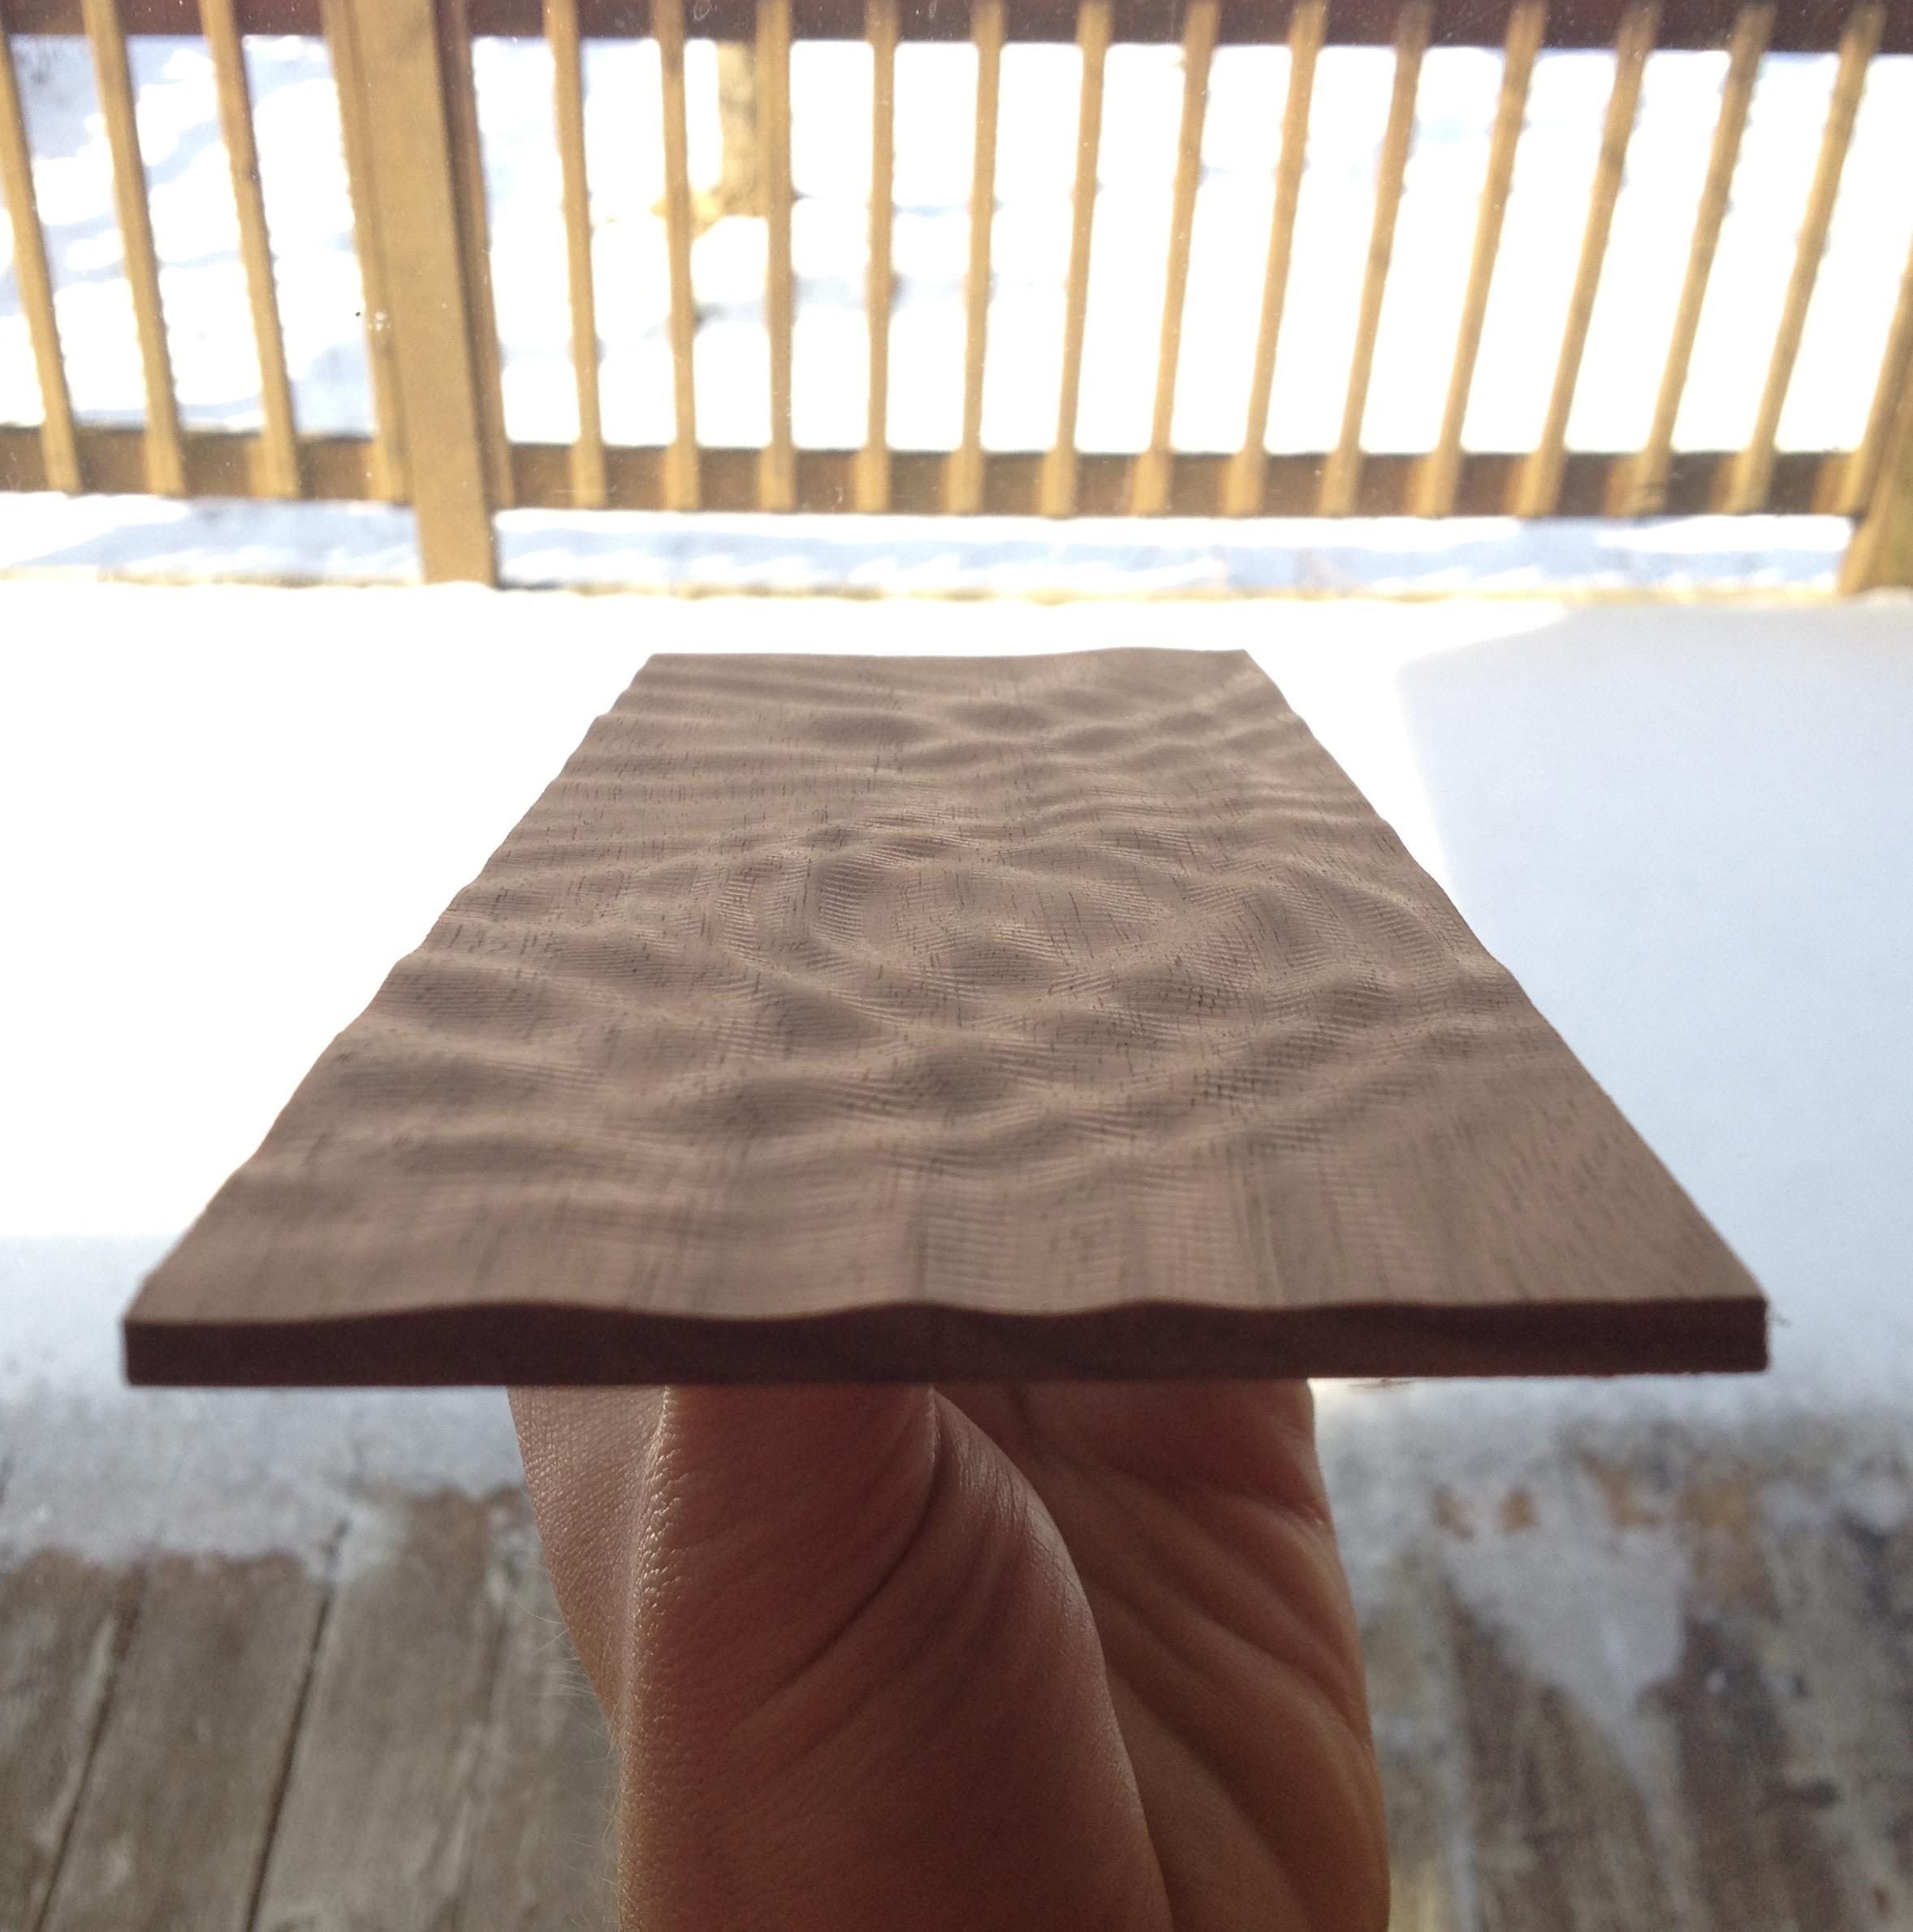 Simulating Water Drops on Wood